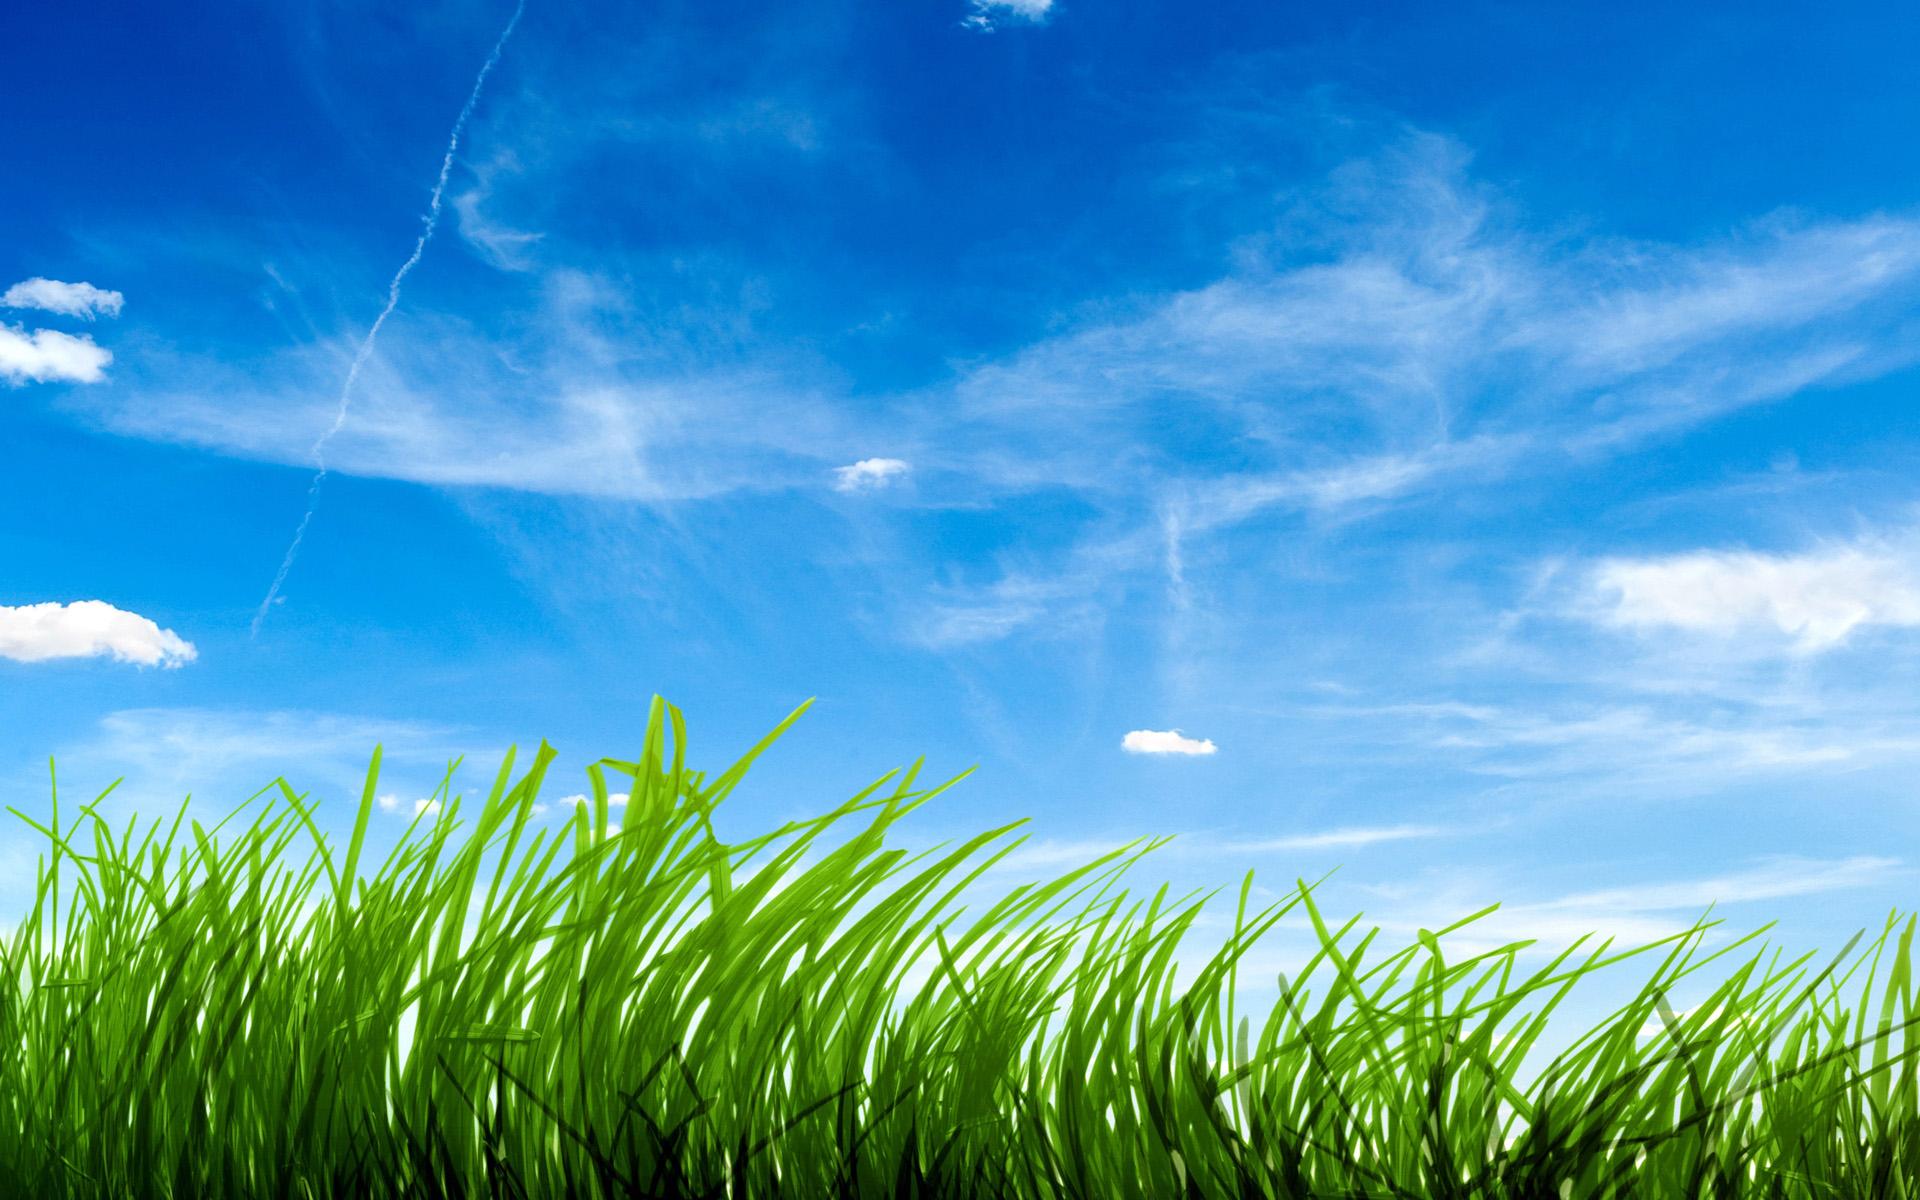 Blue Sky Green Grass Wallpapers | HD Wallpapers